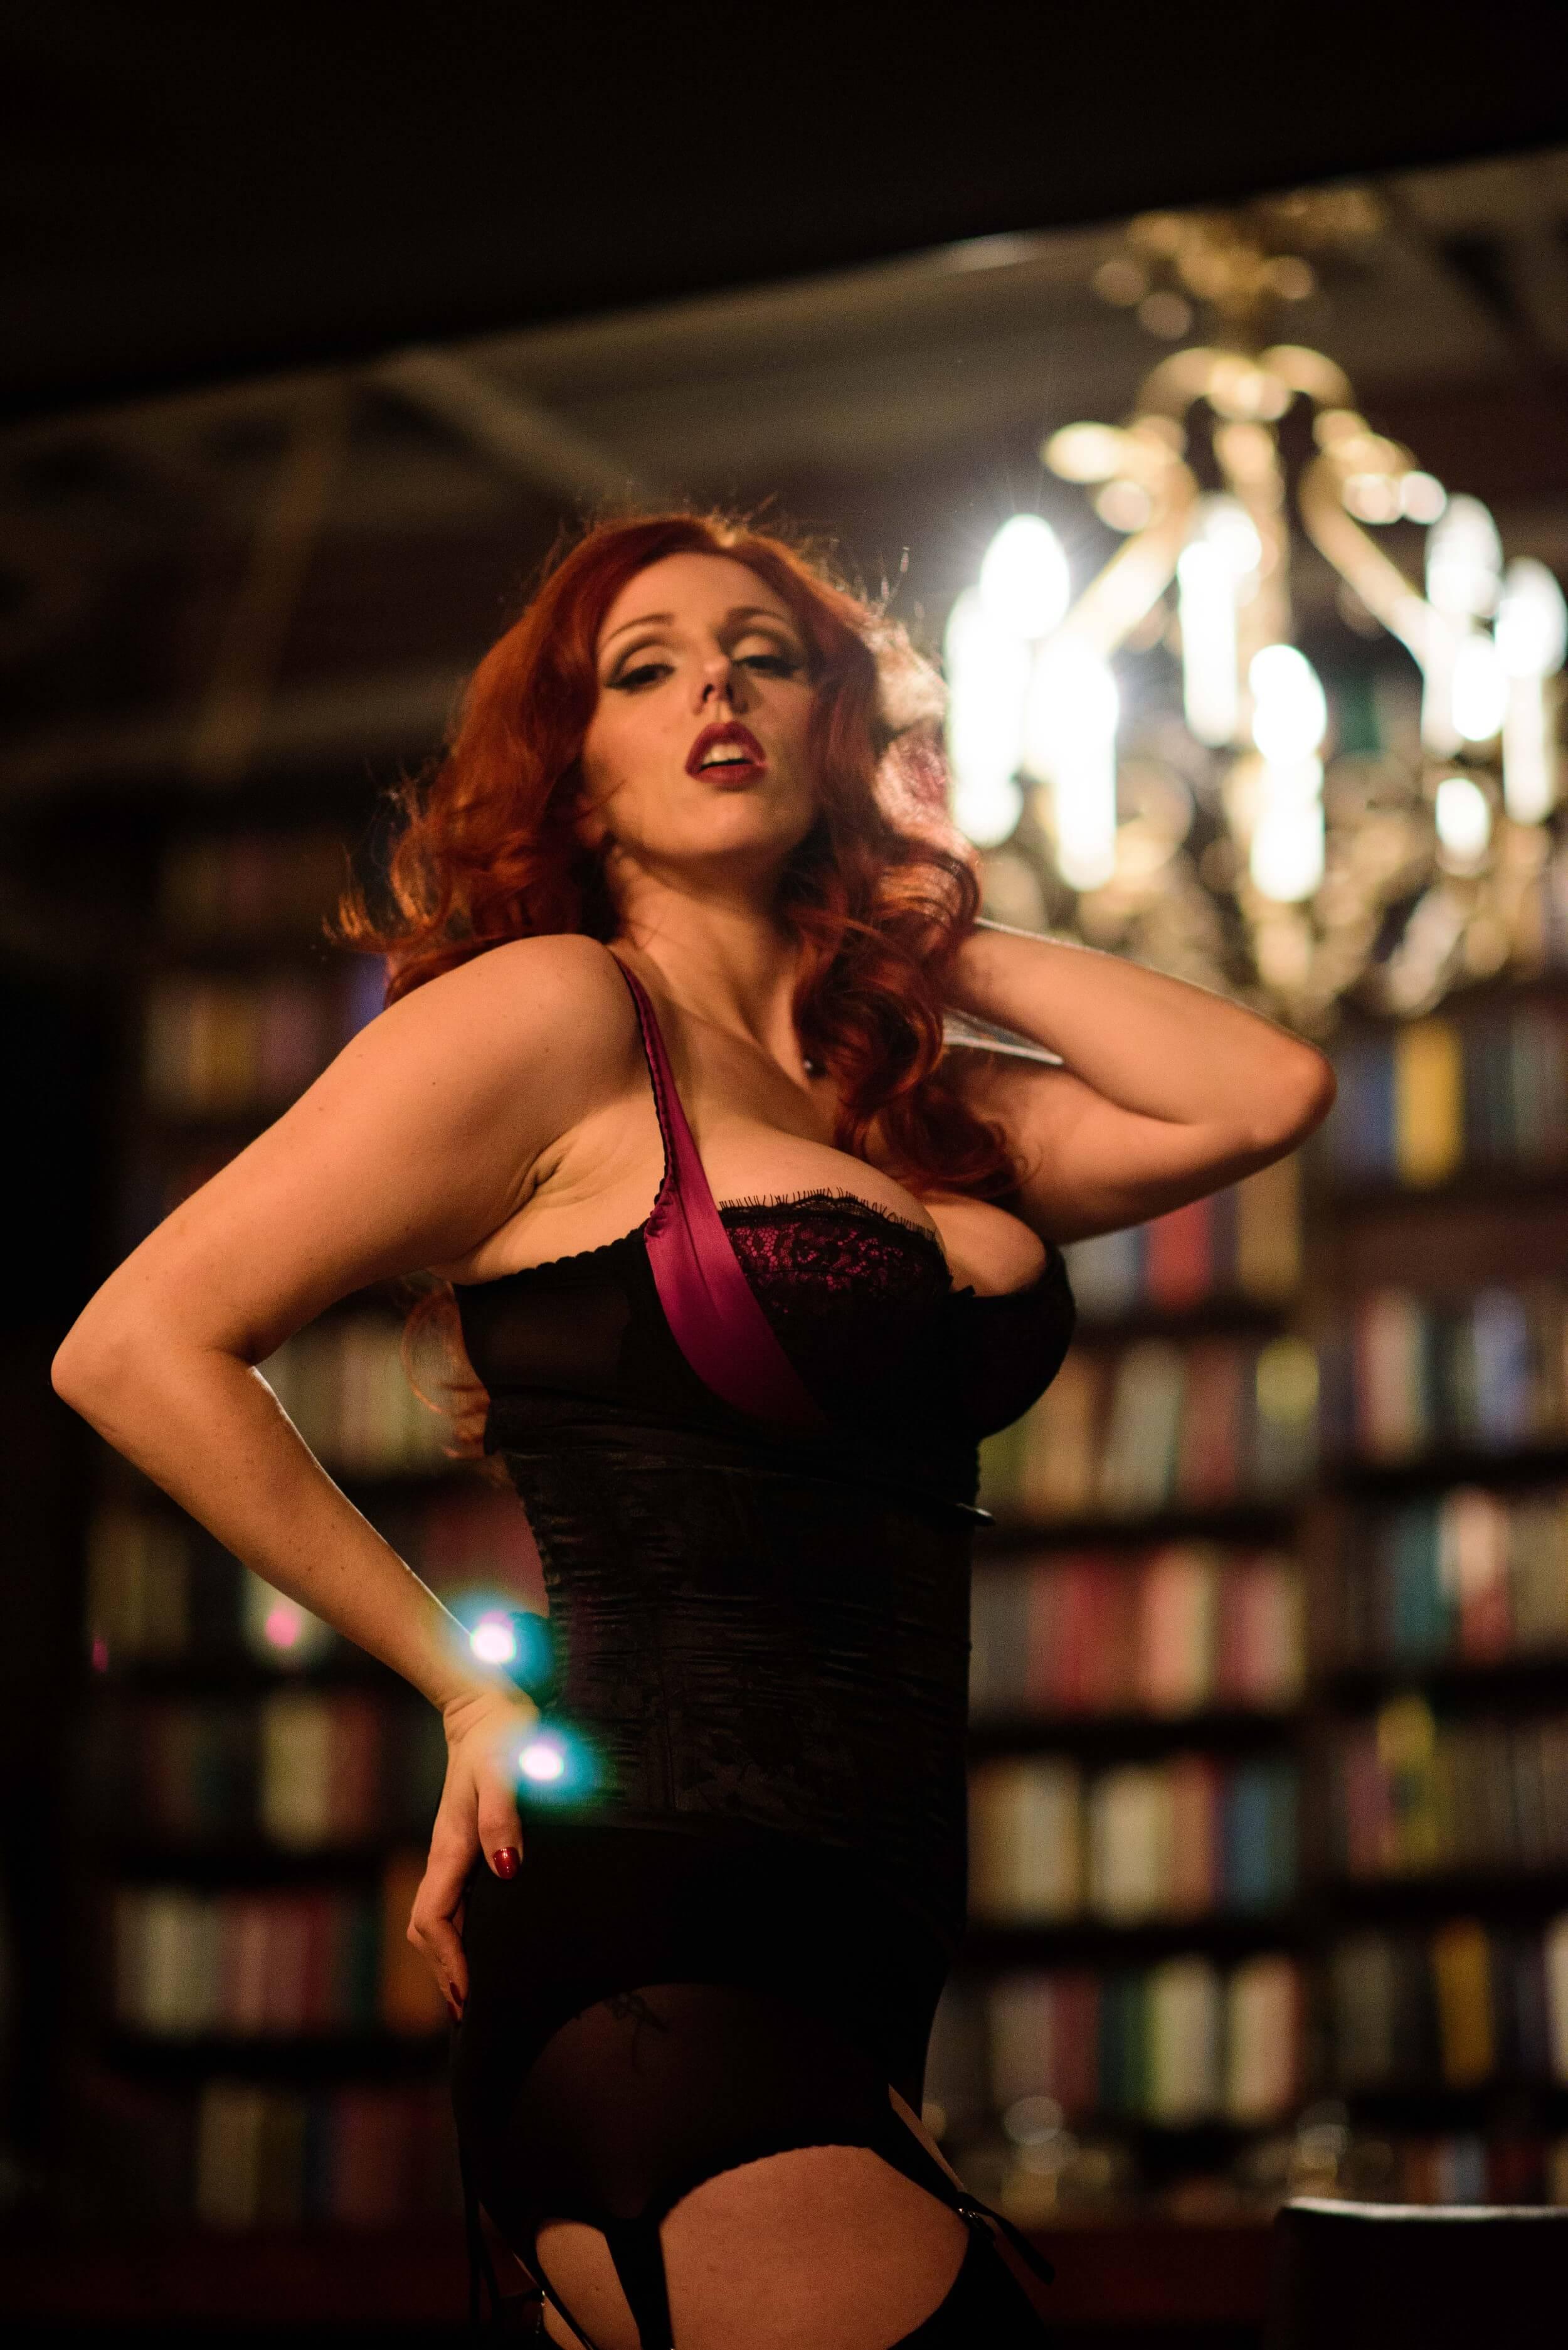 La Femme Fatale Graciela Valdes Photography (4).jpg